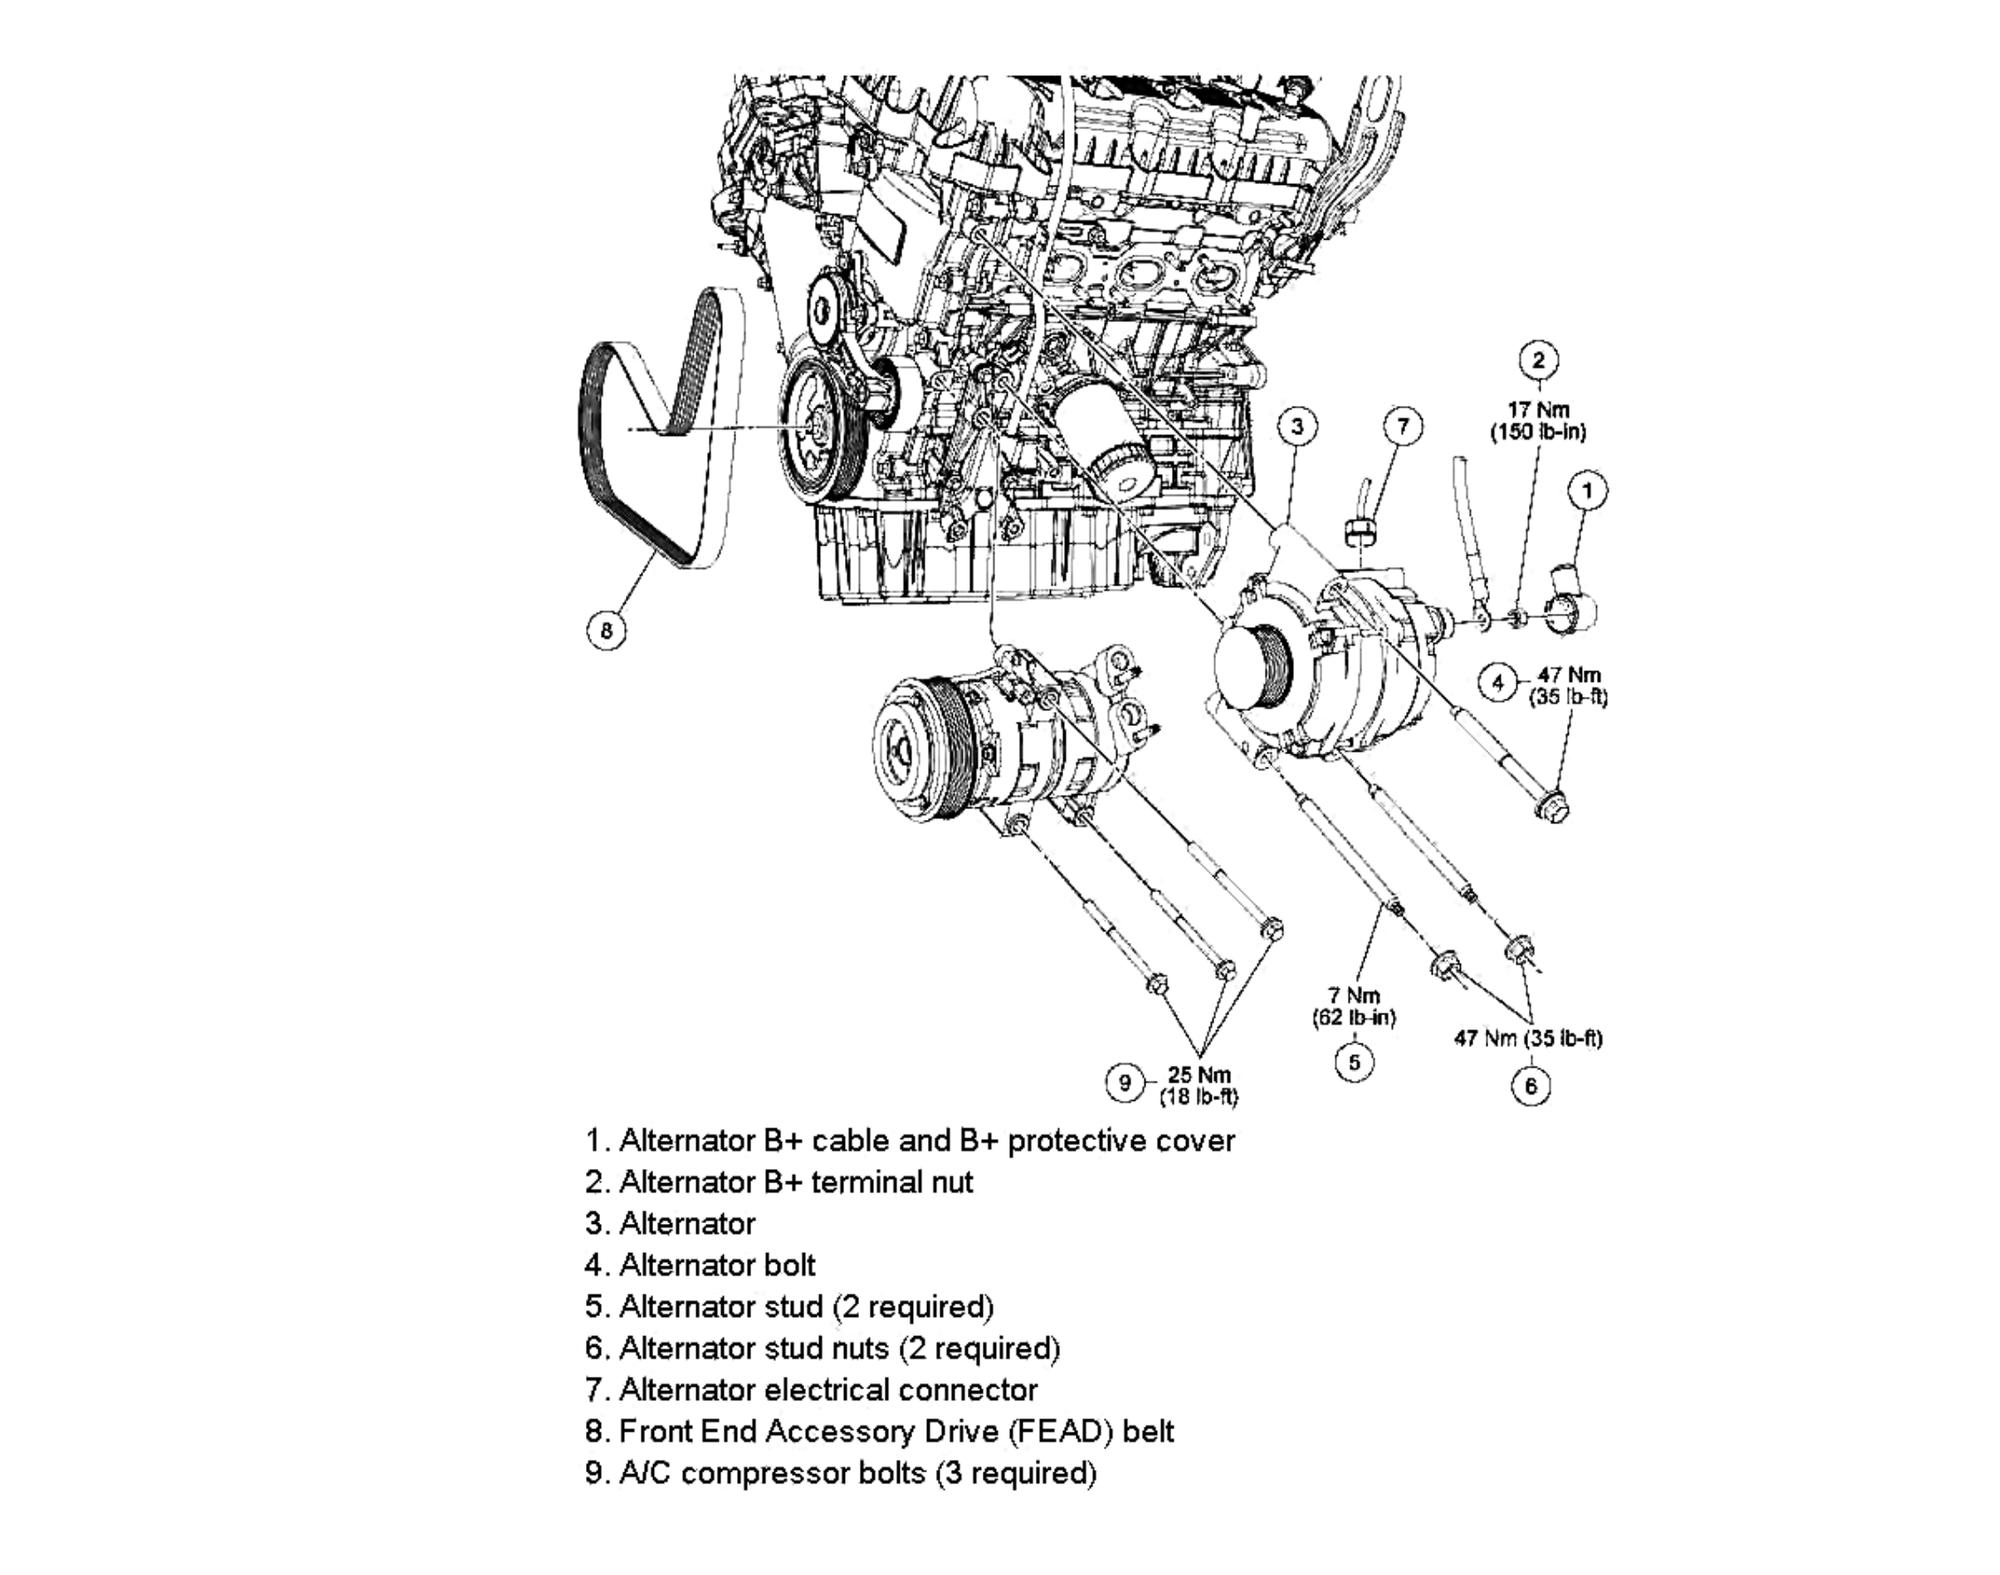 Alternator replacement 2009-12 3 0 V6 - Ford Truck